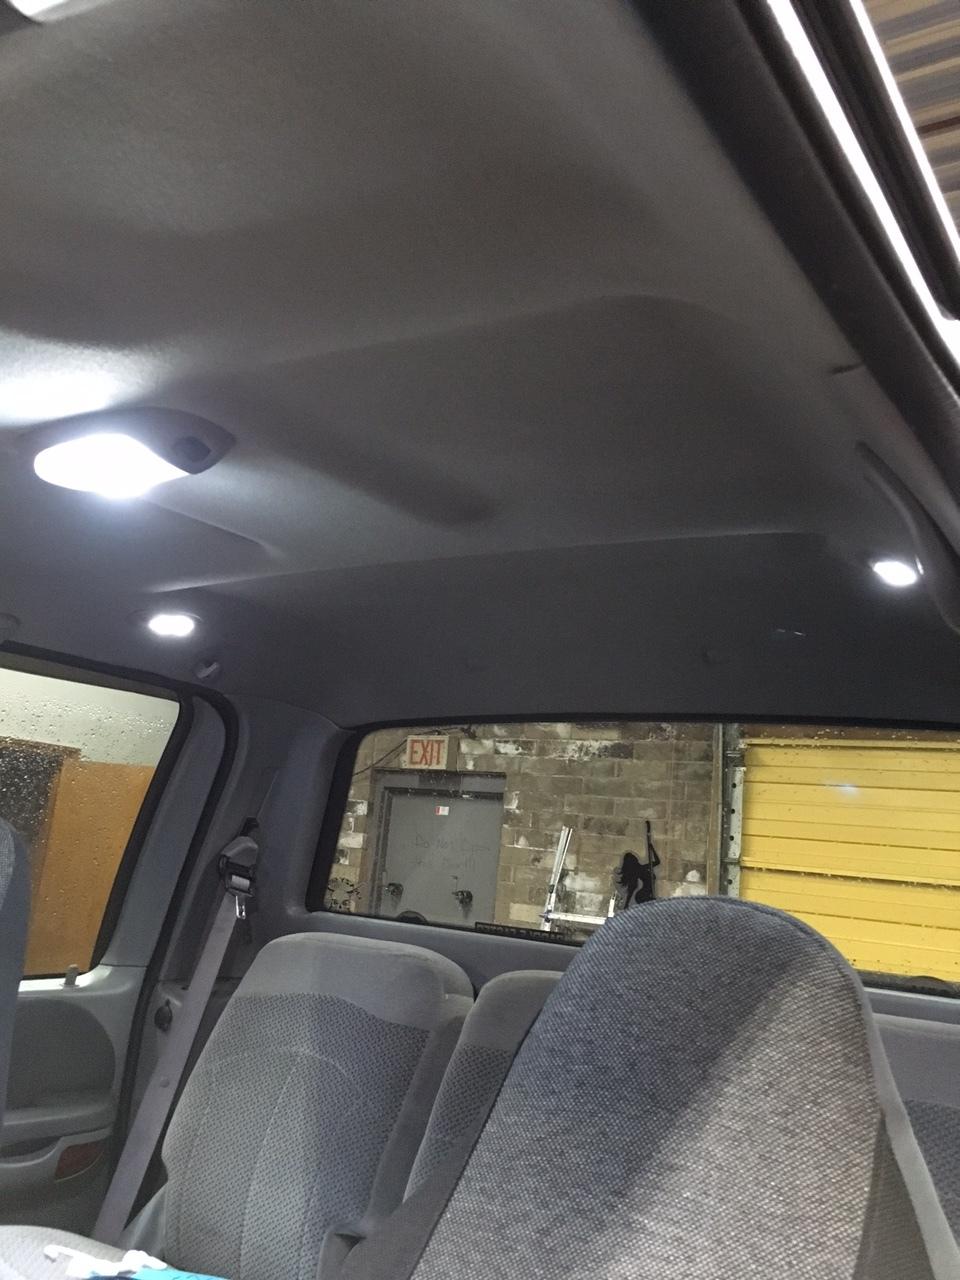 F150 interiors 1.JPG